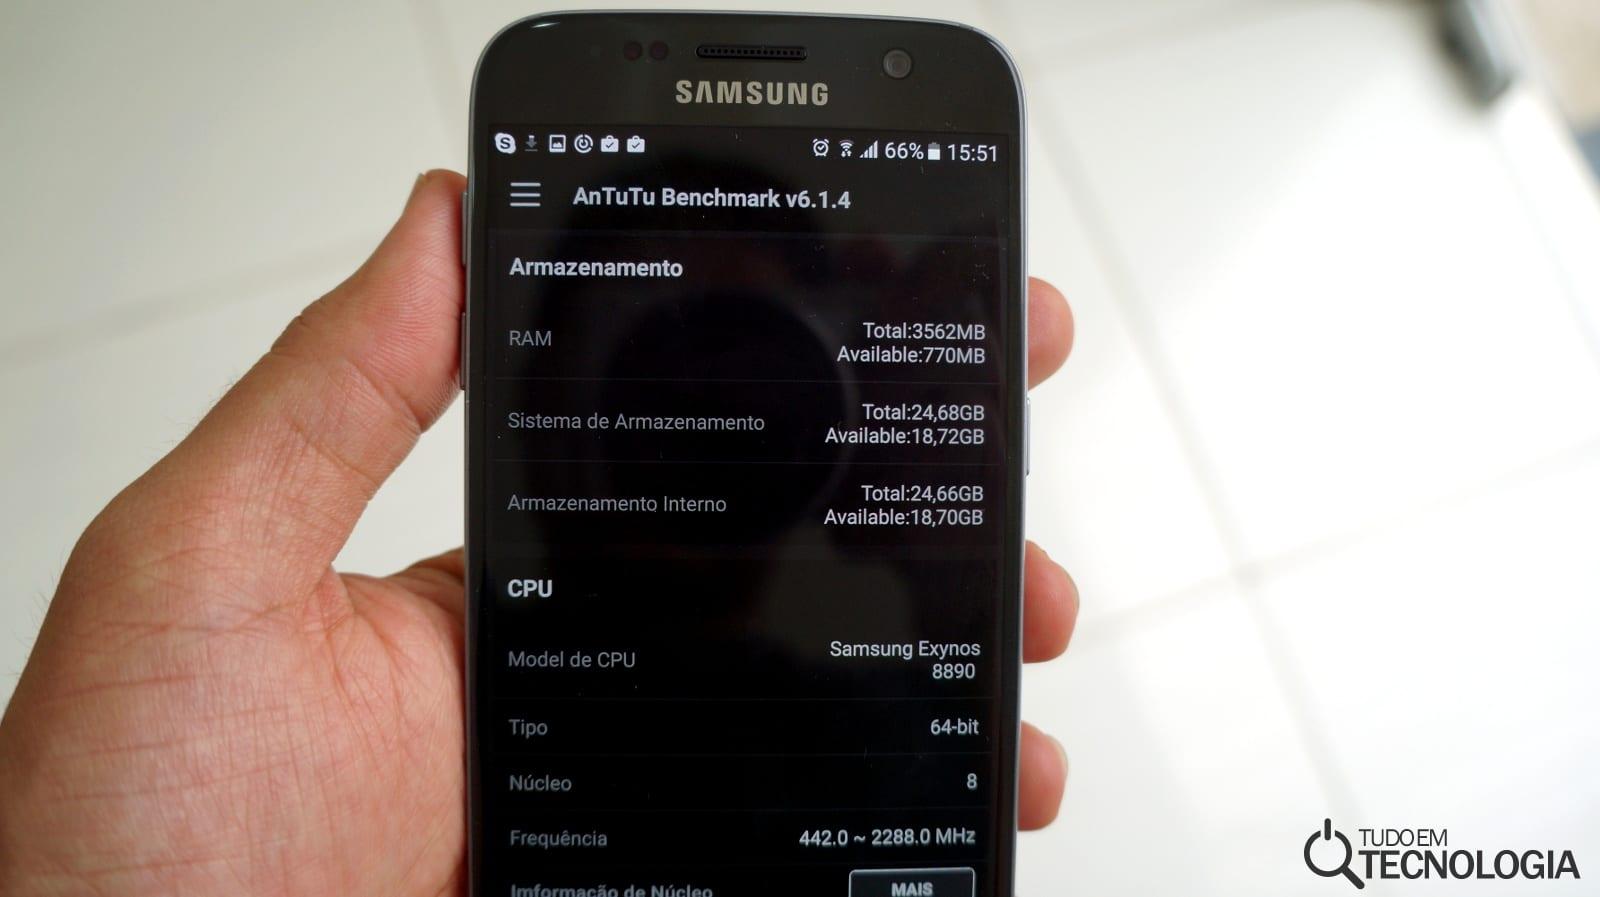 Galaxy S7 hardware